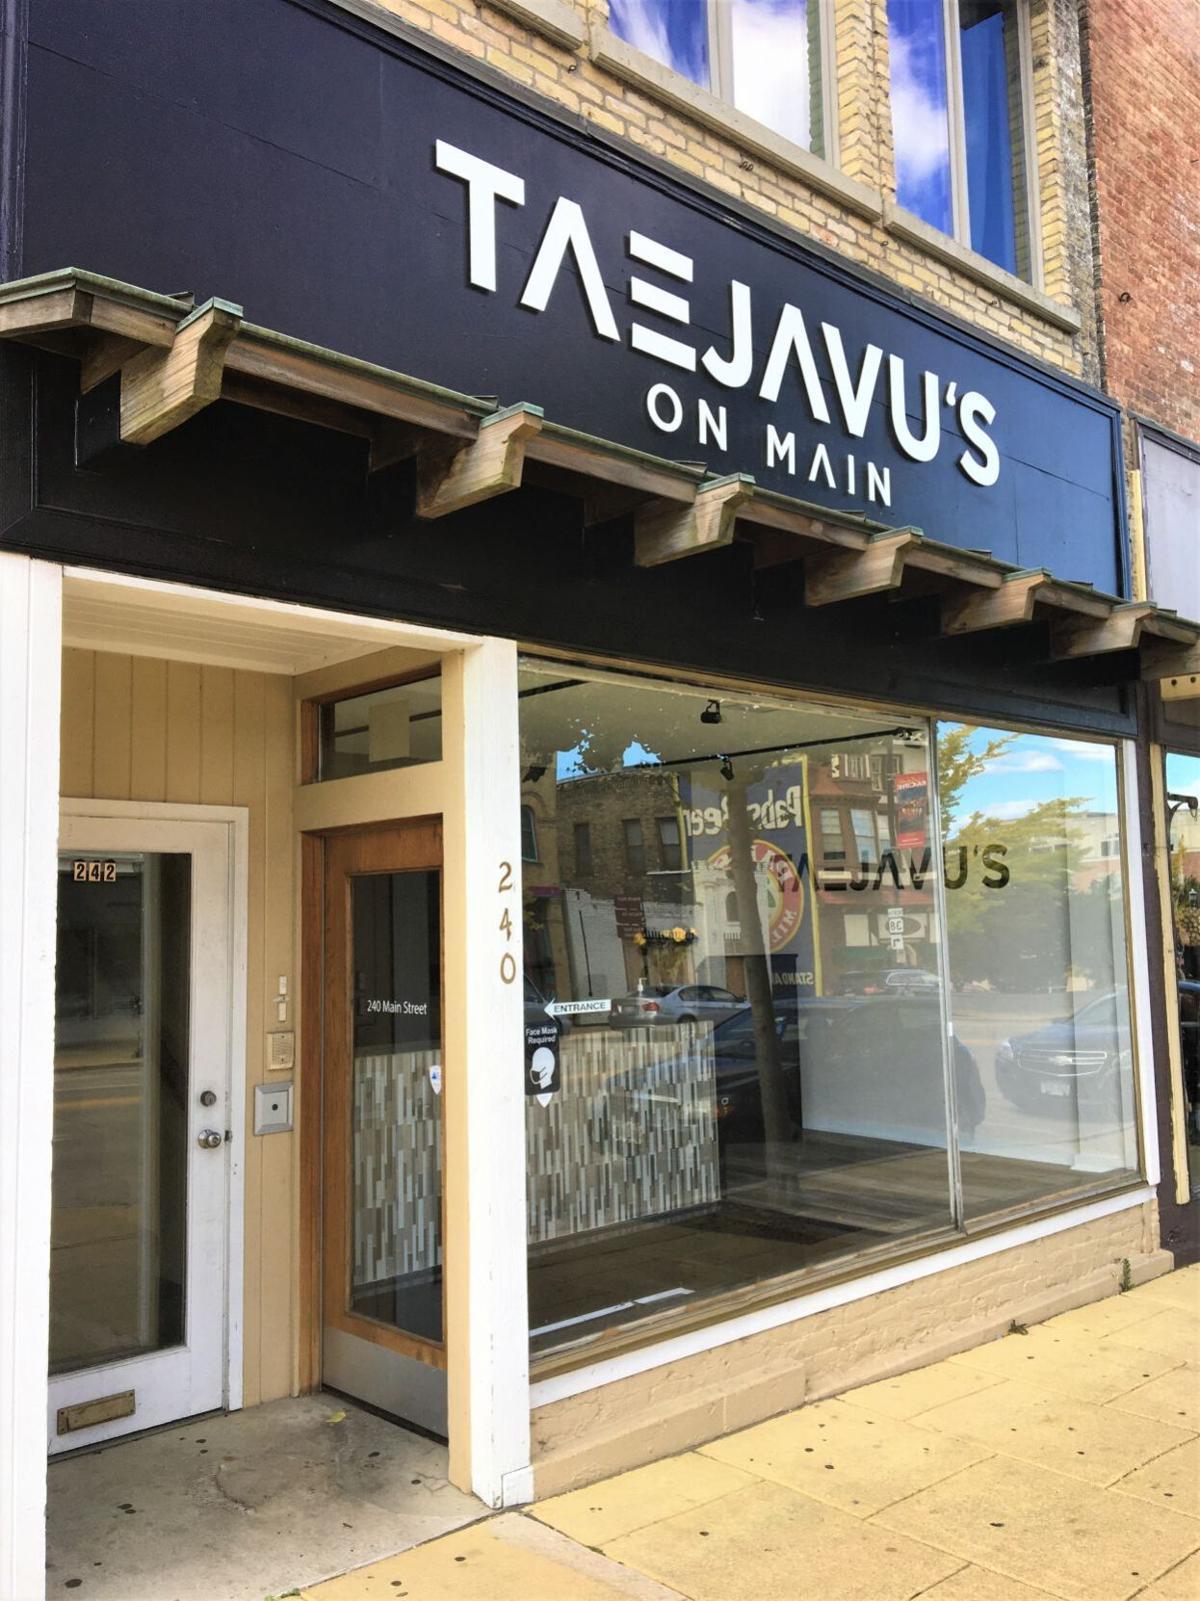 TaejaVu's on Main Exterior Photo